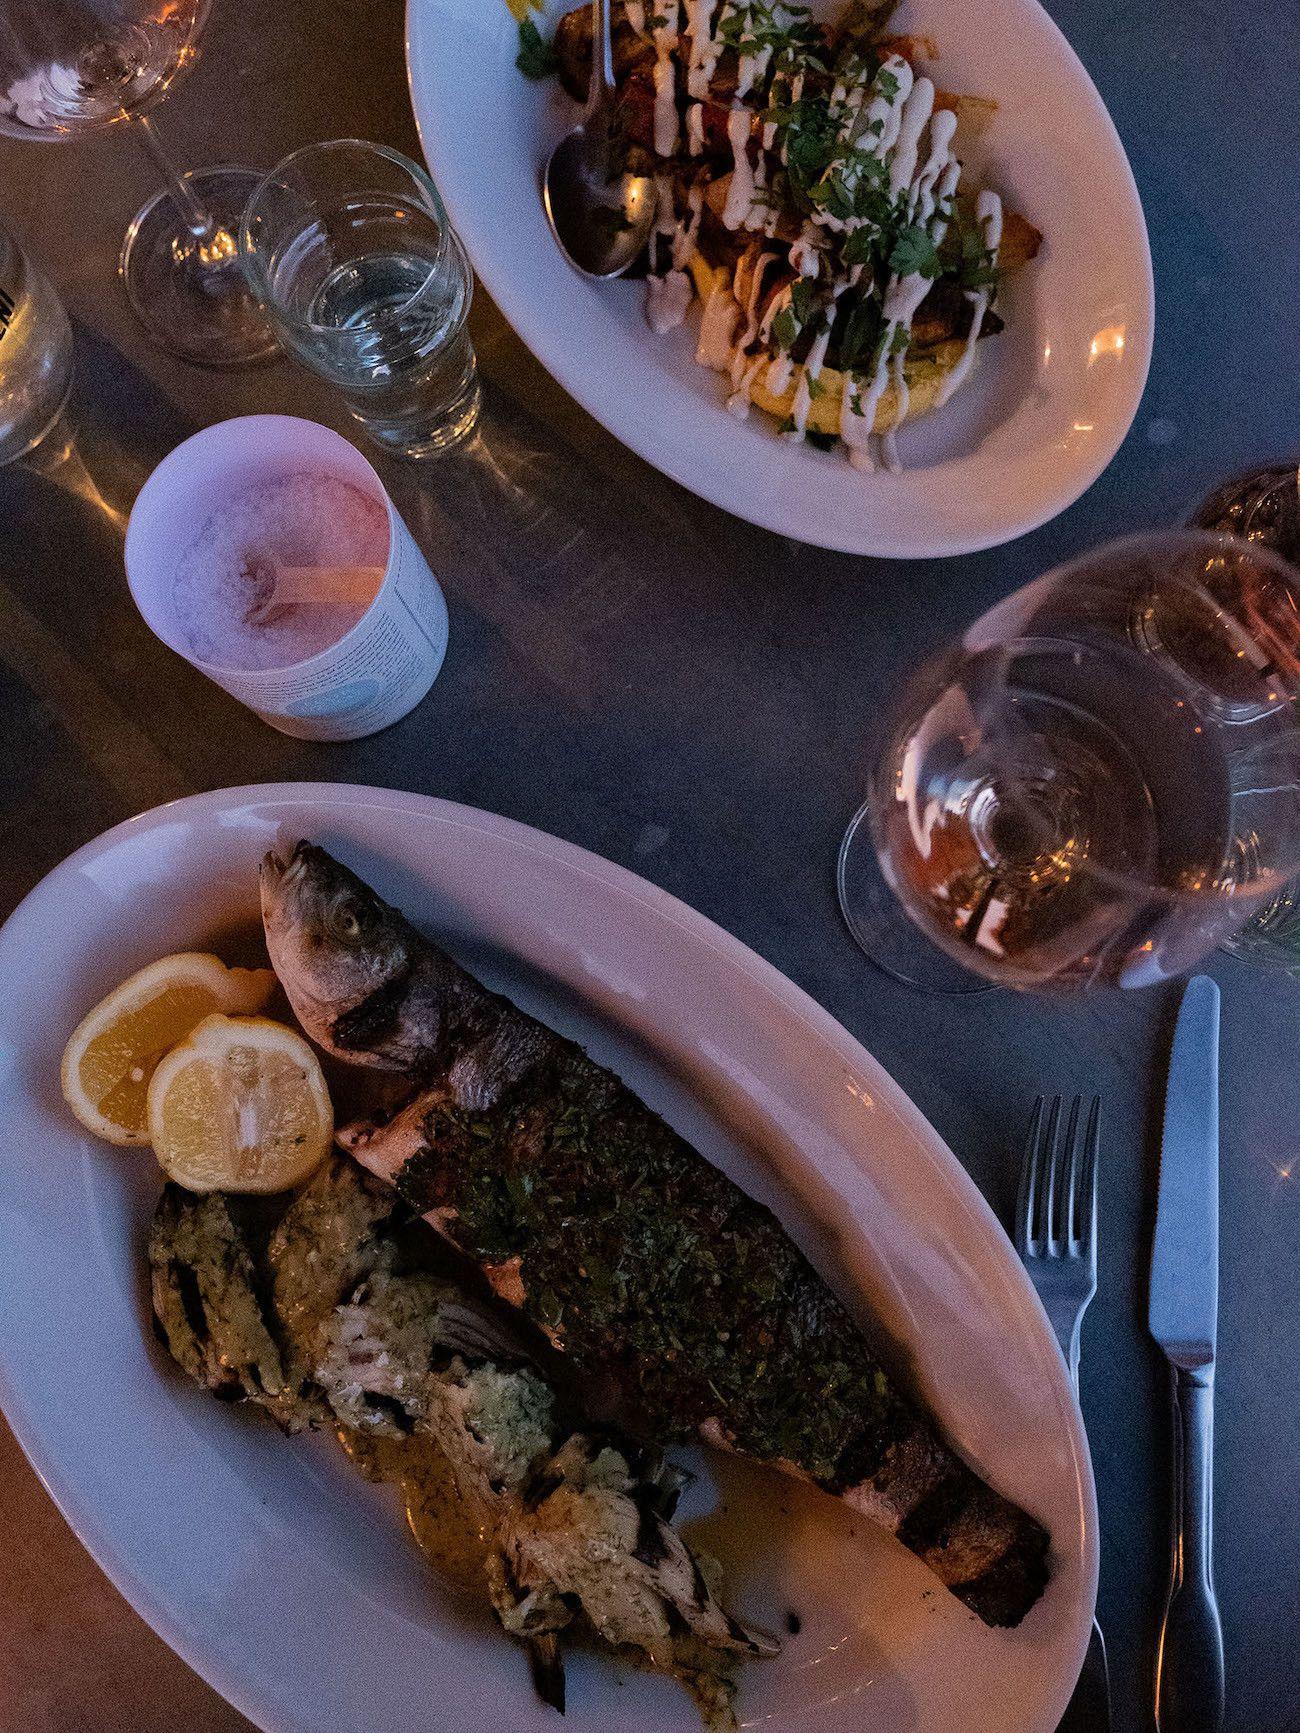 Foodblog About Fuel, Bikini Island & Mountain Hotels, Fisch, Dinner, Neni